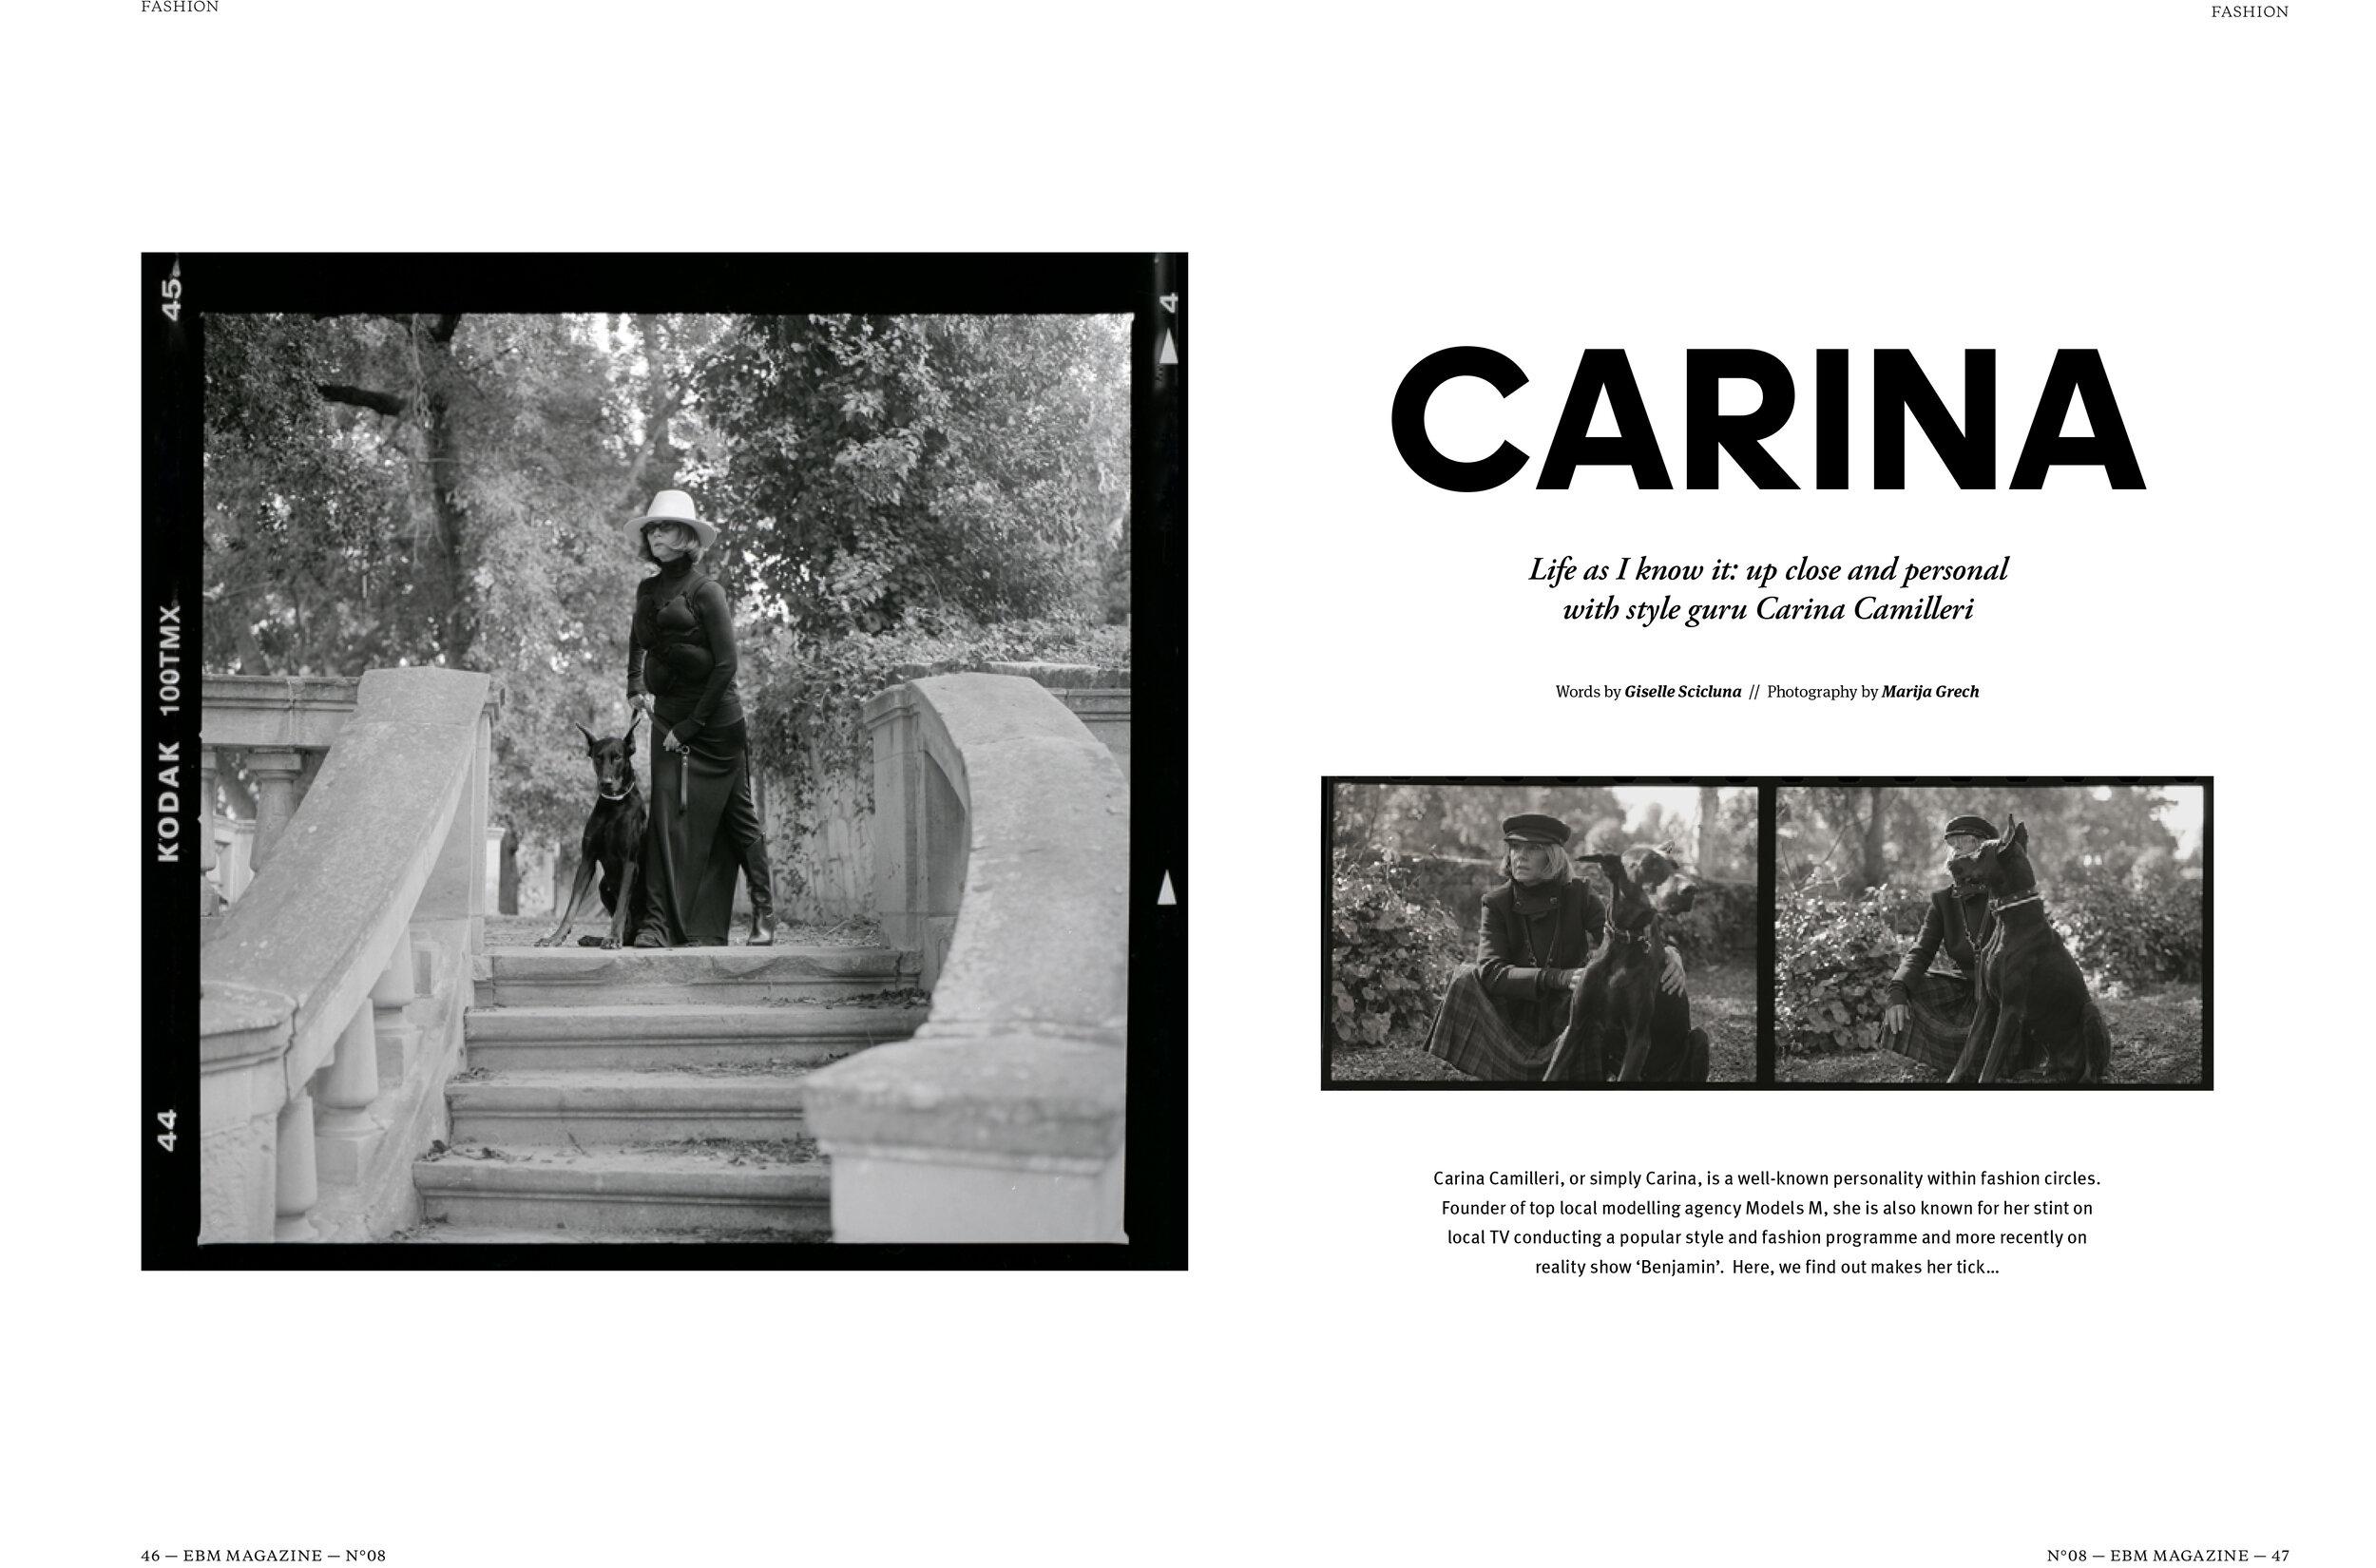 EBM_Magazine_ISSUU_Medium-47 copy.jpg